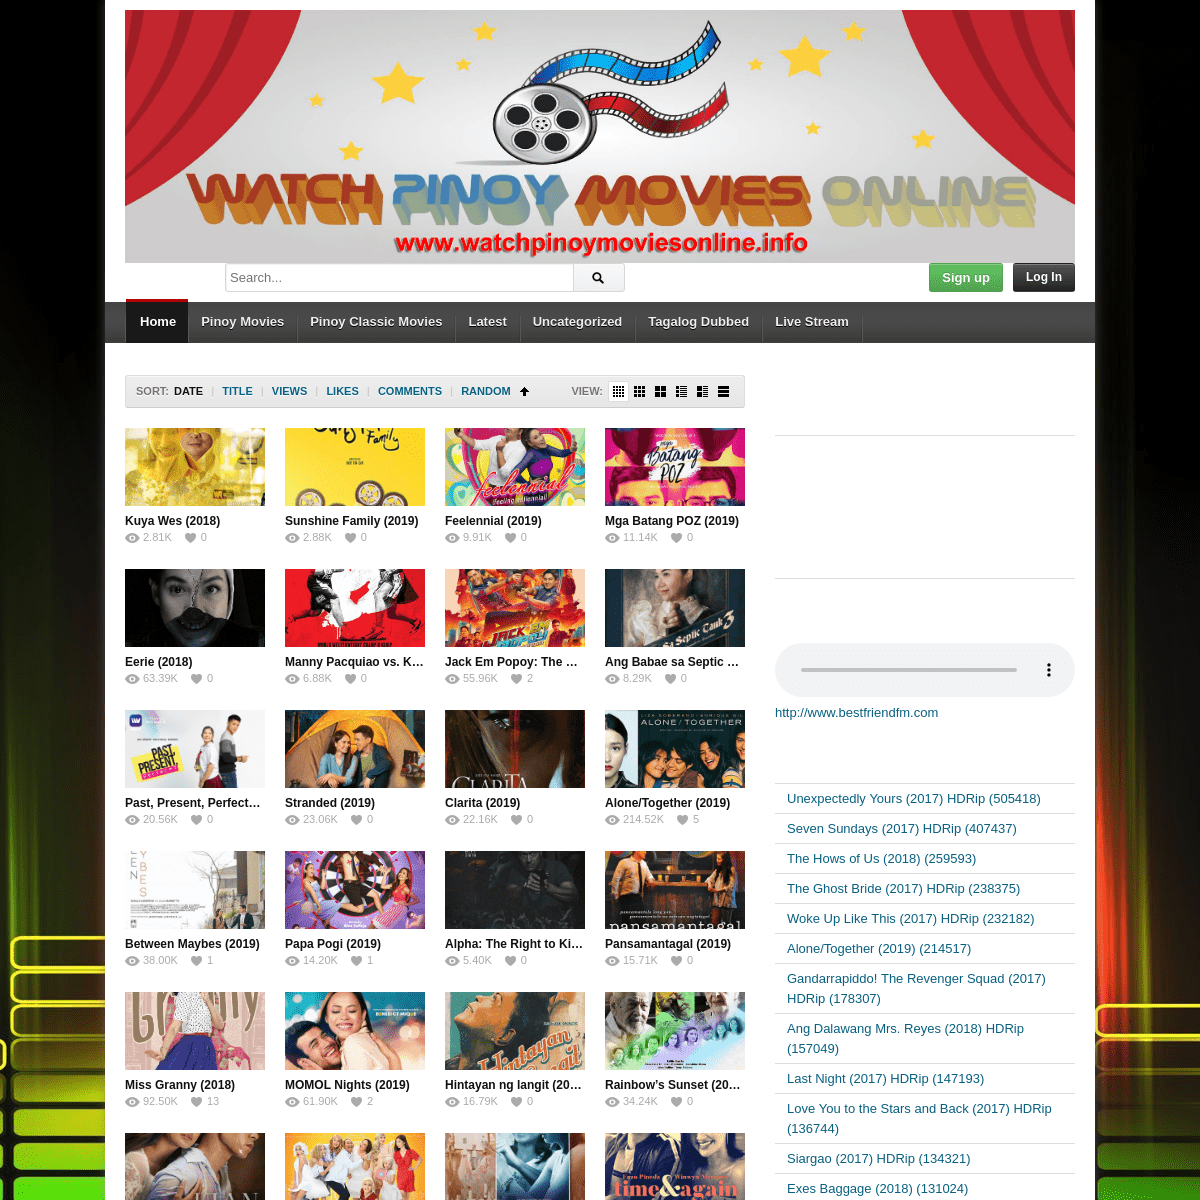 Watchpinoymoviesonline Info Free Full Hd Pinoy Movies Latest Pinoy Movies Classic Pinoy Movies Tagalog Movies Tagalog